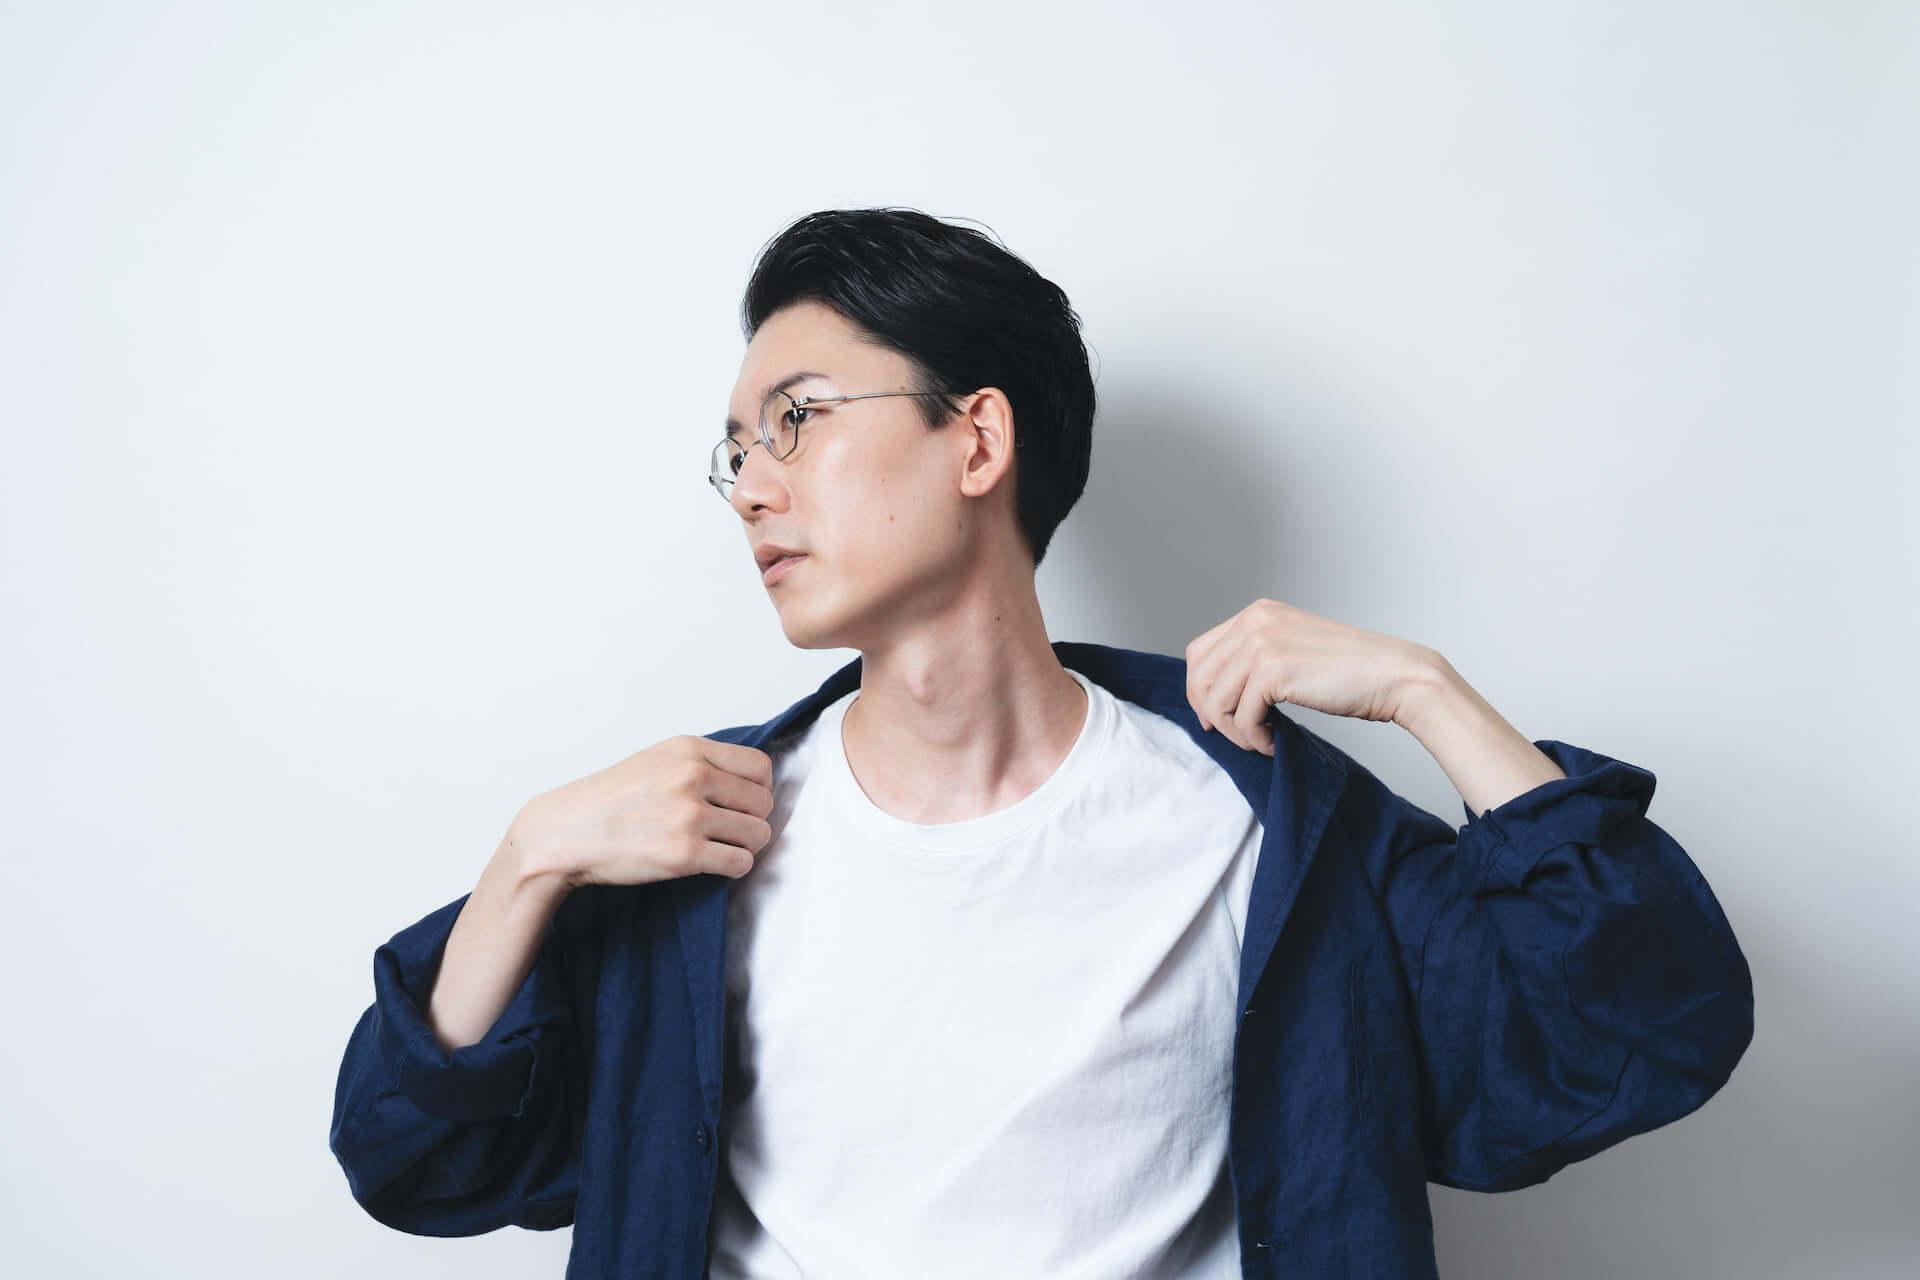 Kan Sano最新アルバム『Susanna』のリリースライブが東京&大阪で開催決定!渋谷WWW X公演は配信も実施 music201111_kan_sano_1-1920x1280